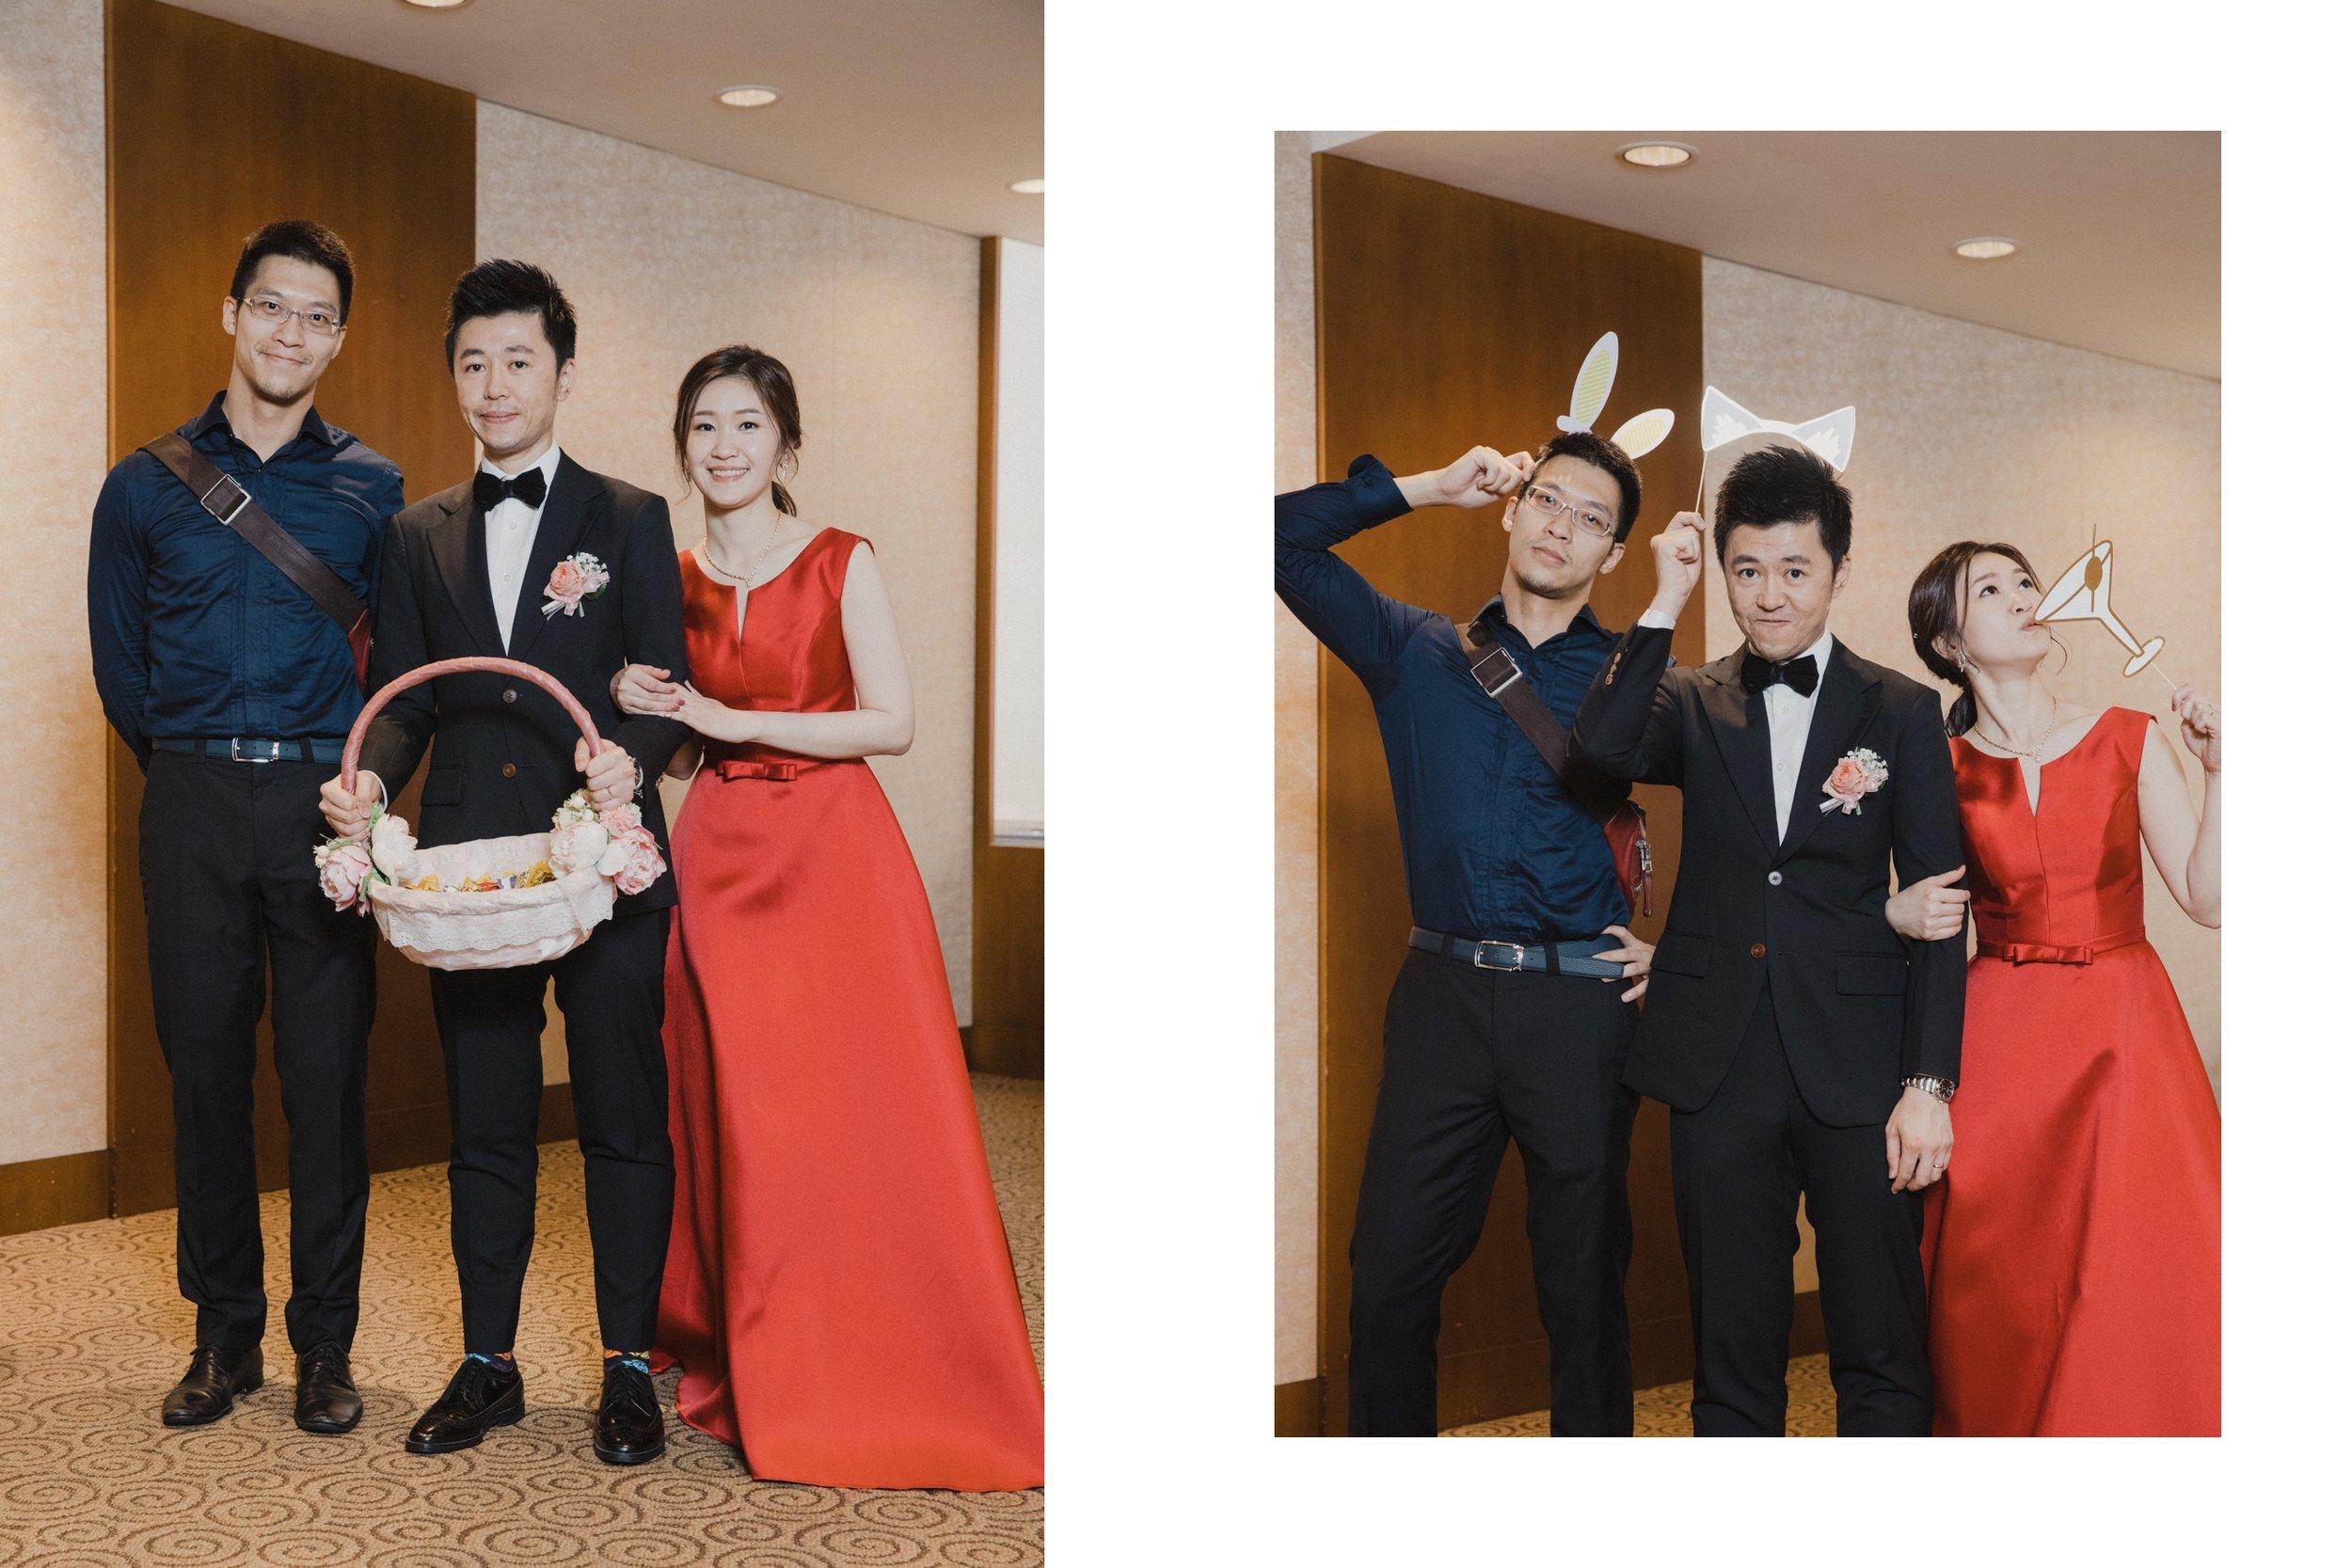 wedding-caridee-oscar-lunch-ambassador-hsinchu-結婚午宴-新竹國賓_158.jpg